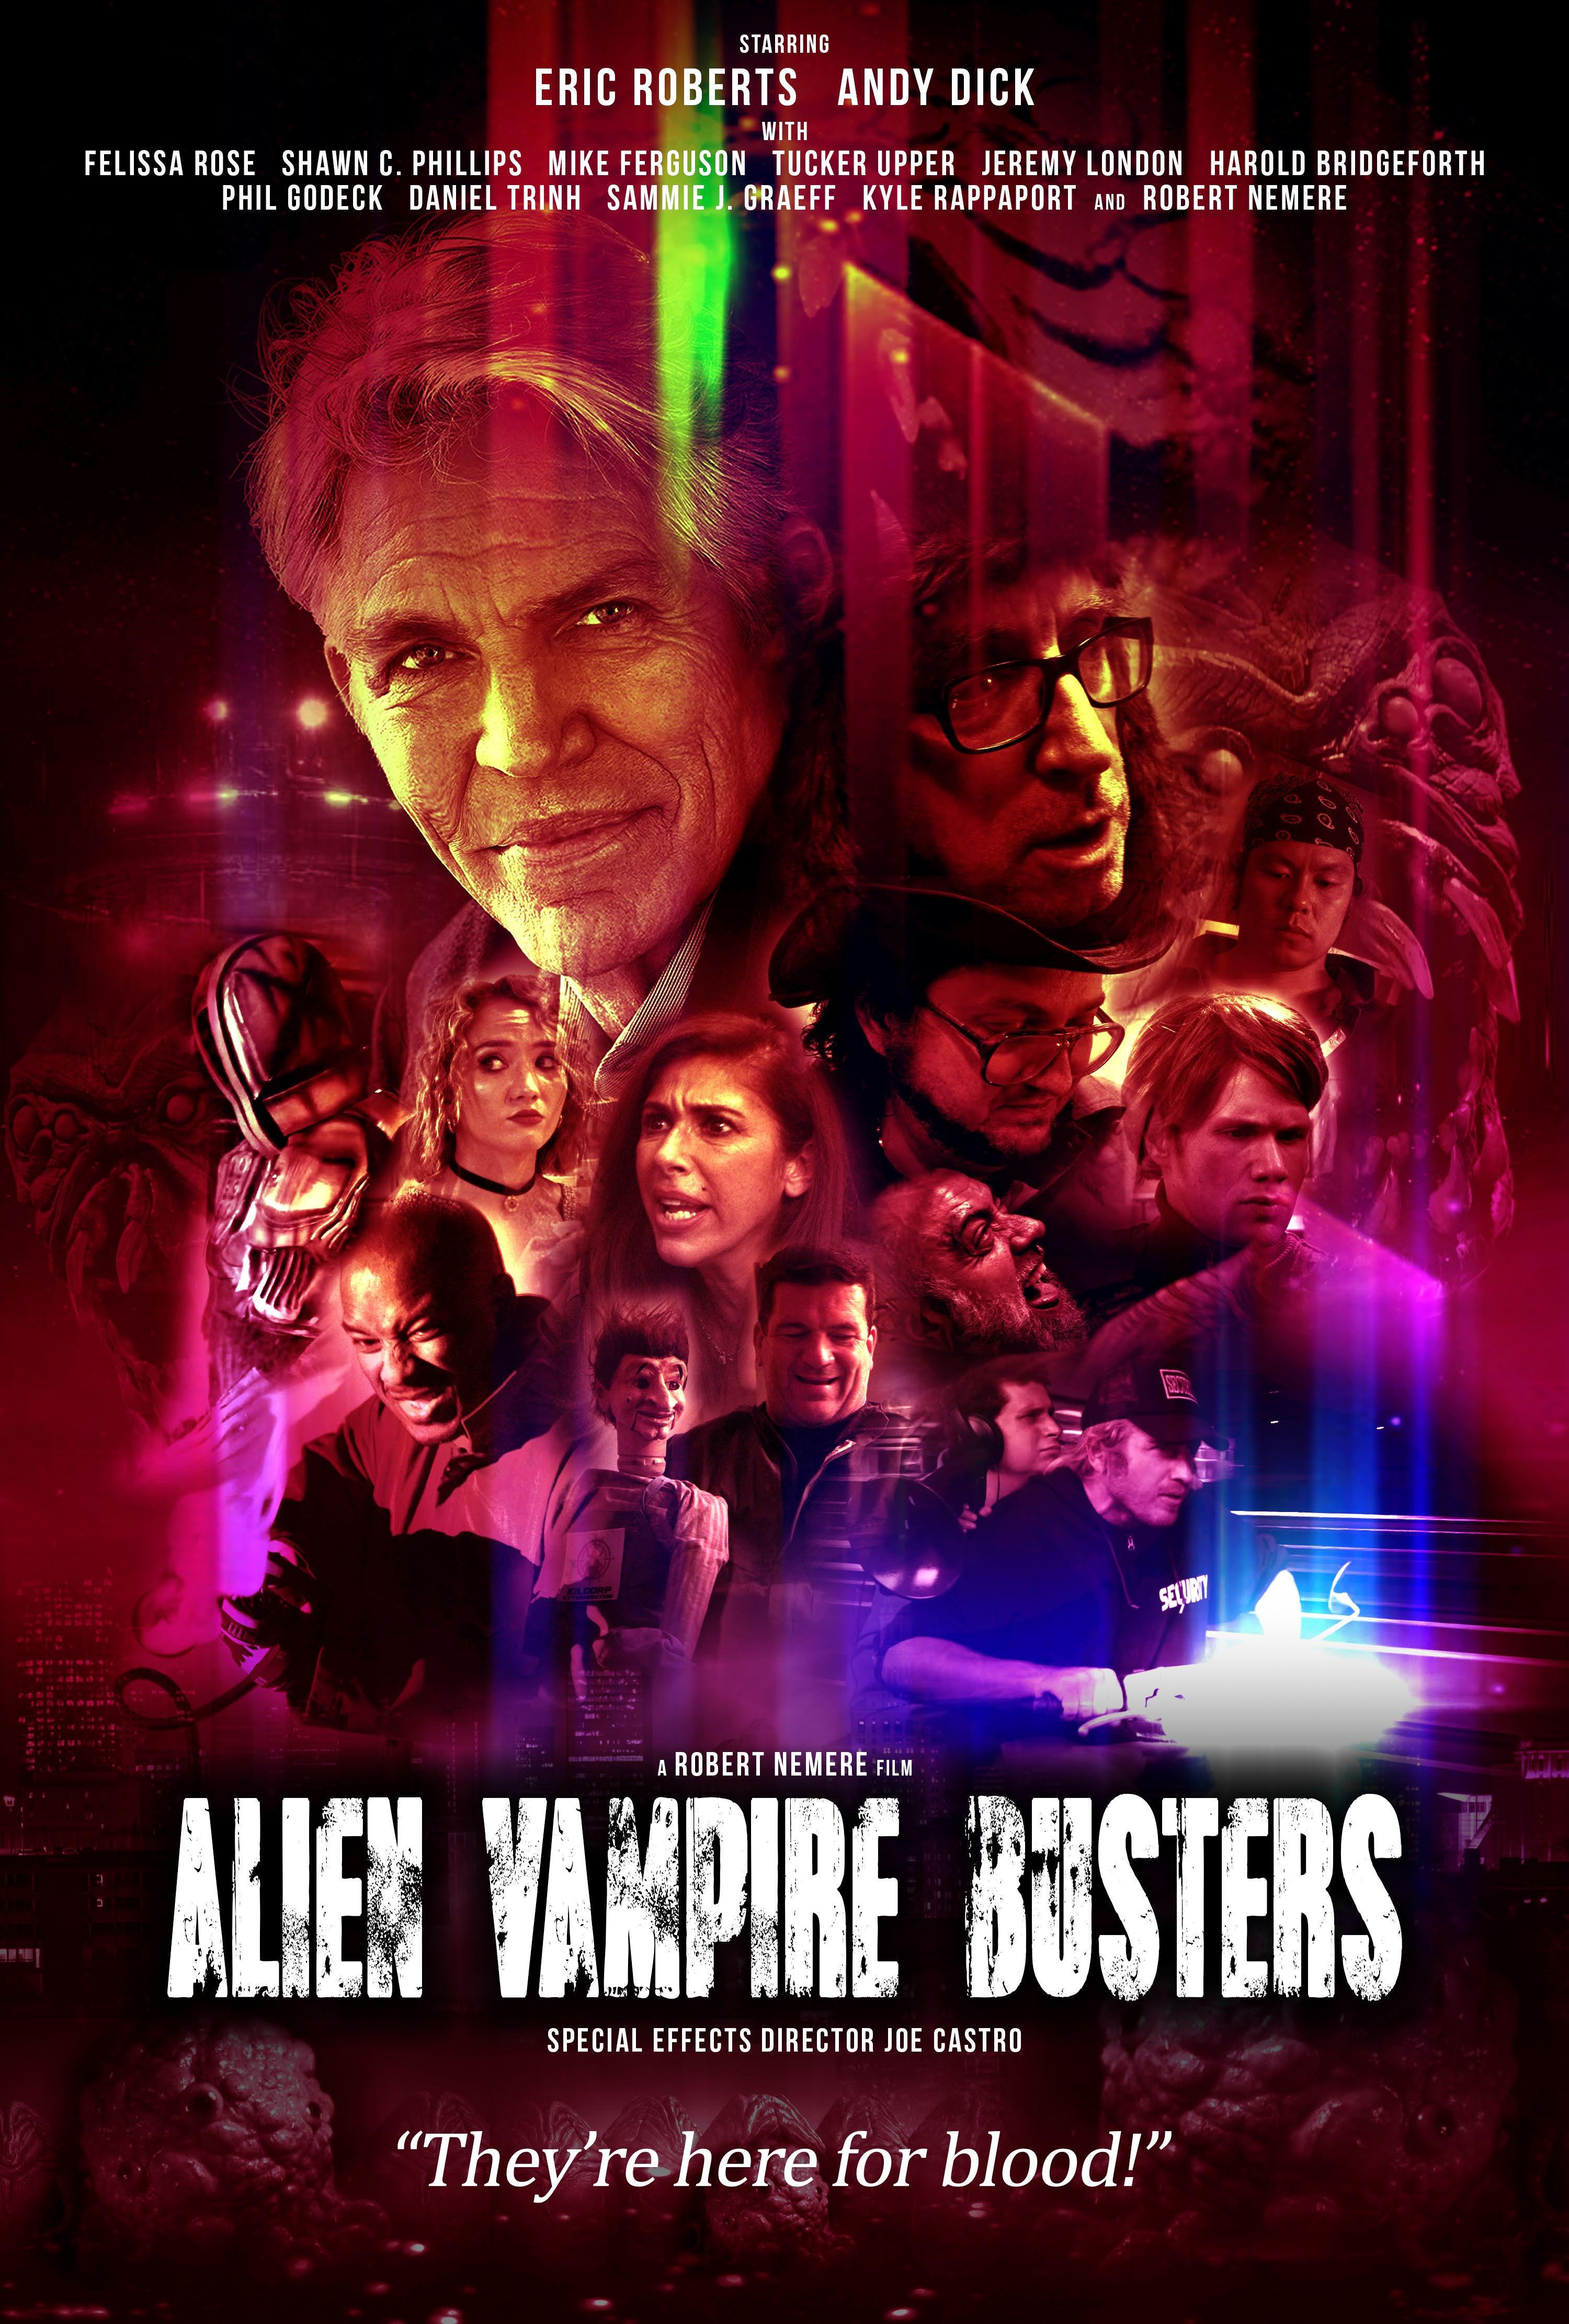 Alien Vampire Busters